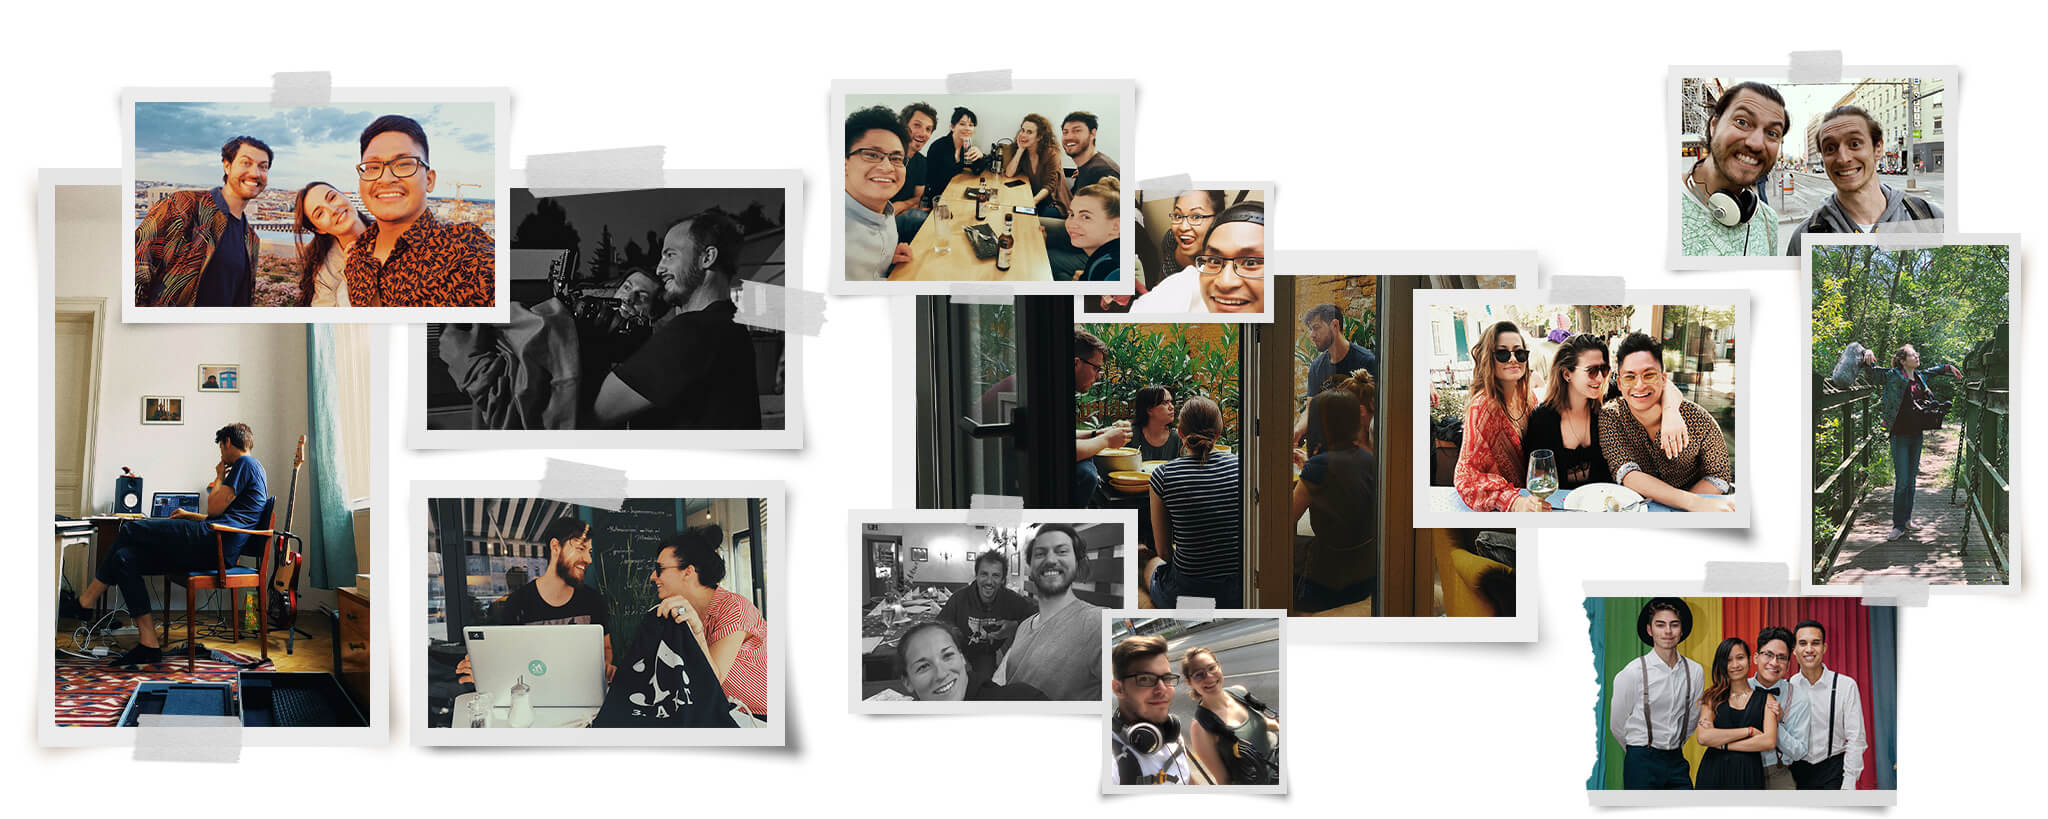 210210_dritterakt_collage_lb3a_03